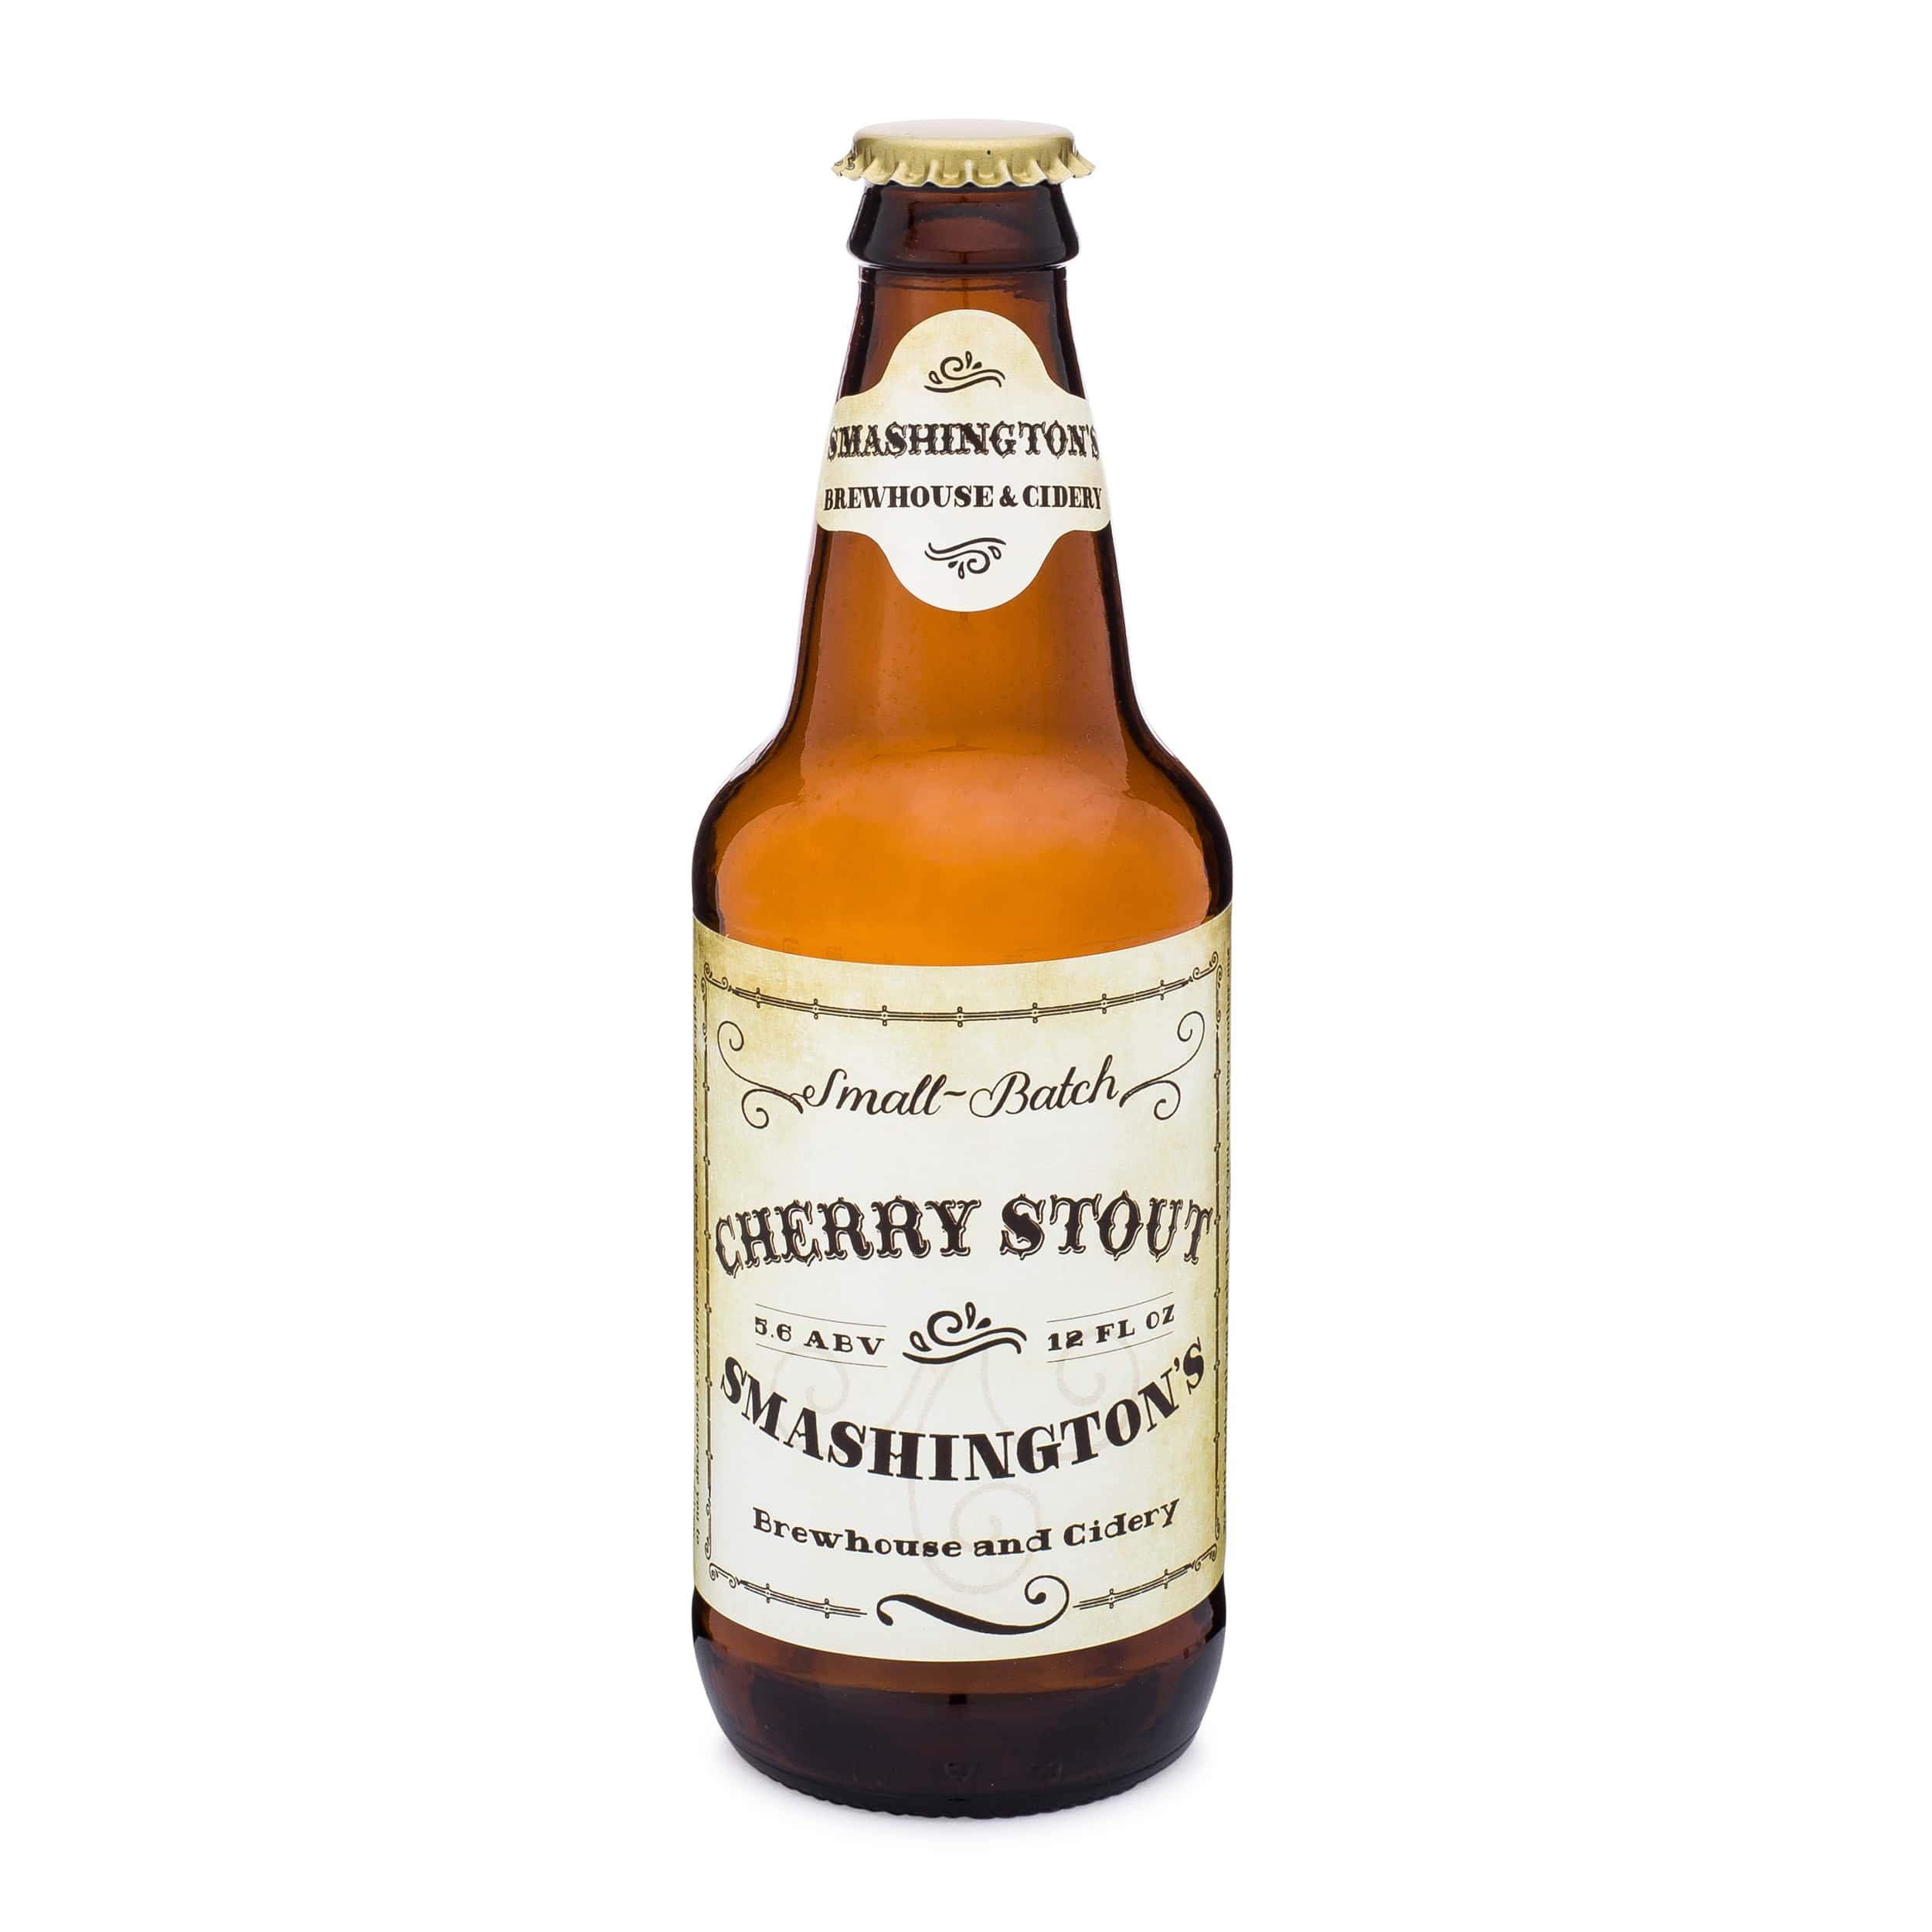 Heritage Beer Bottle with sample label